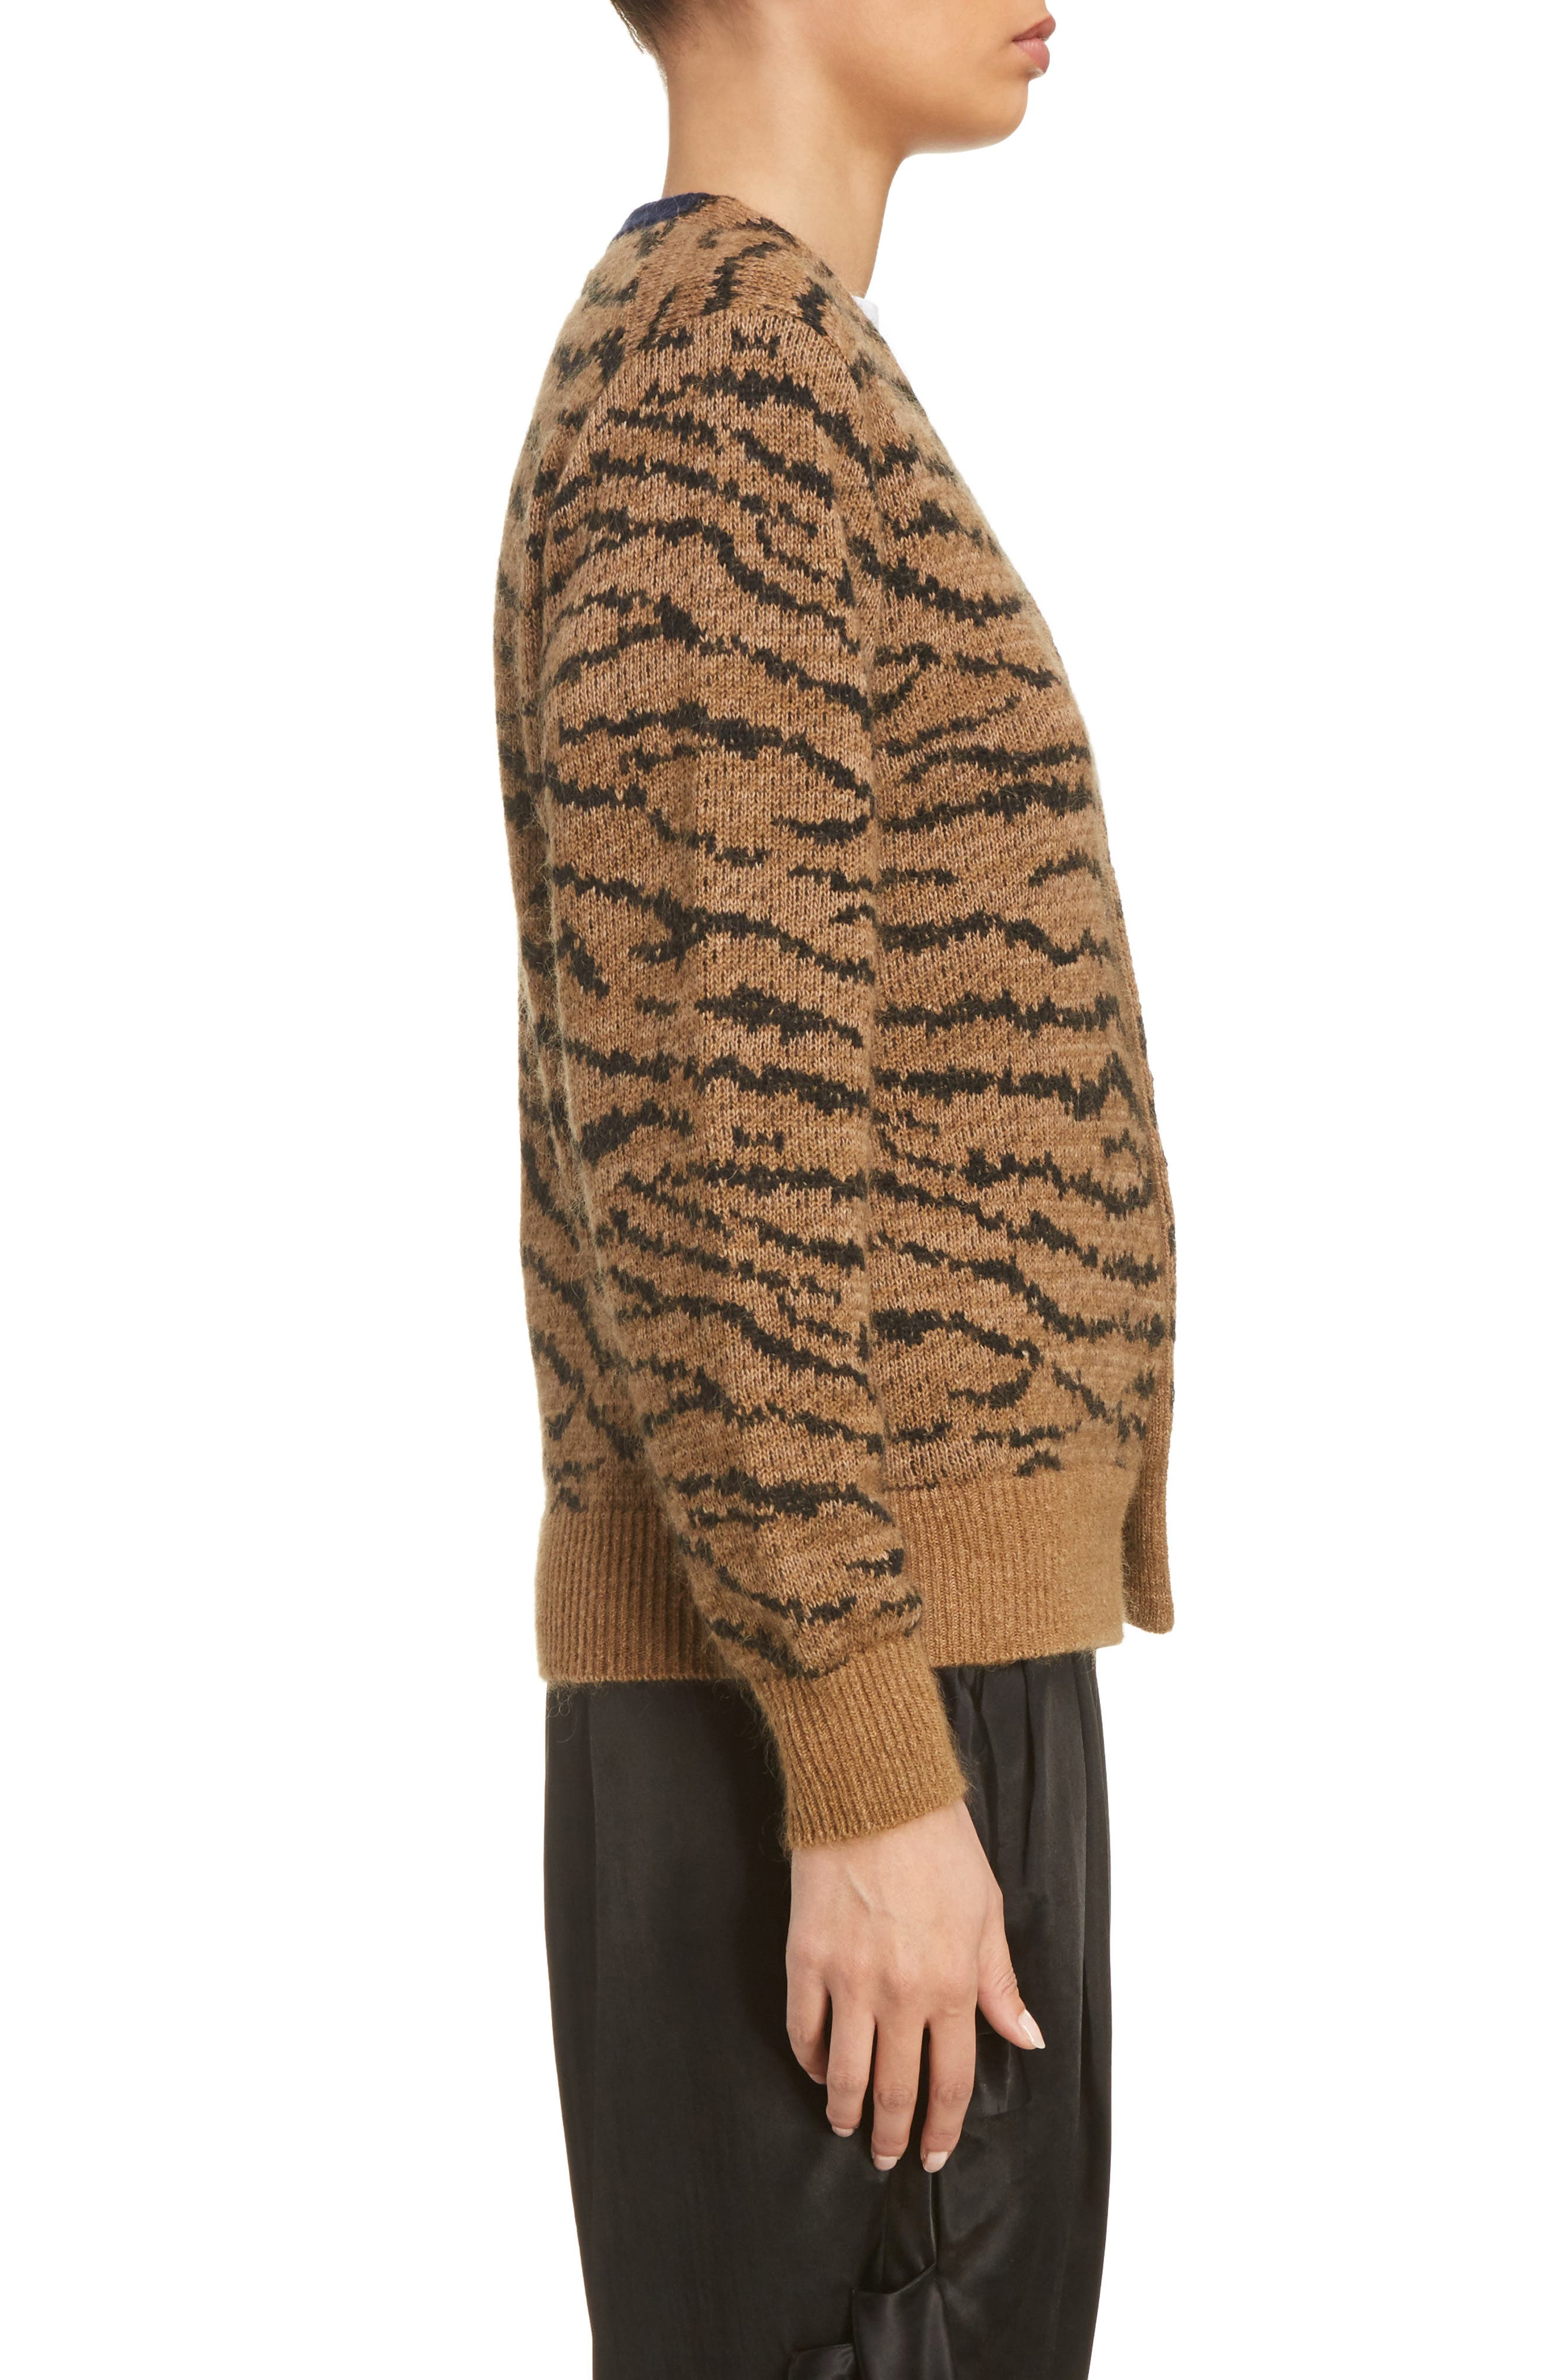 Tiger Jacquard Knit Button Cardigan,                             Alternate thumbnail 3, color,                             250